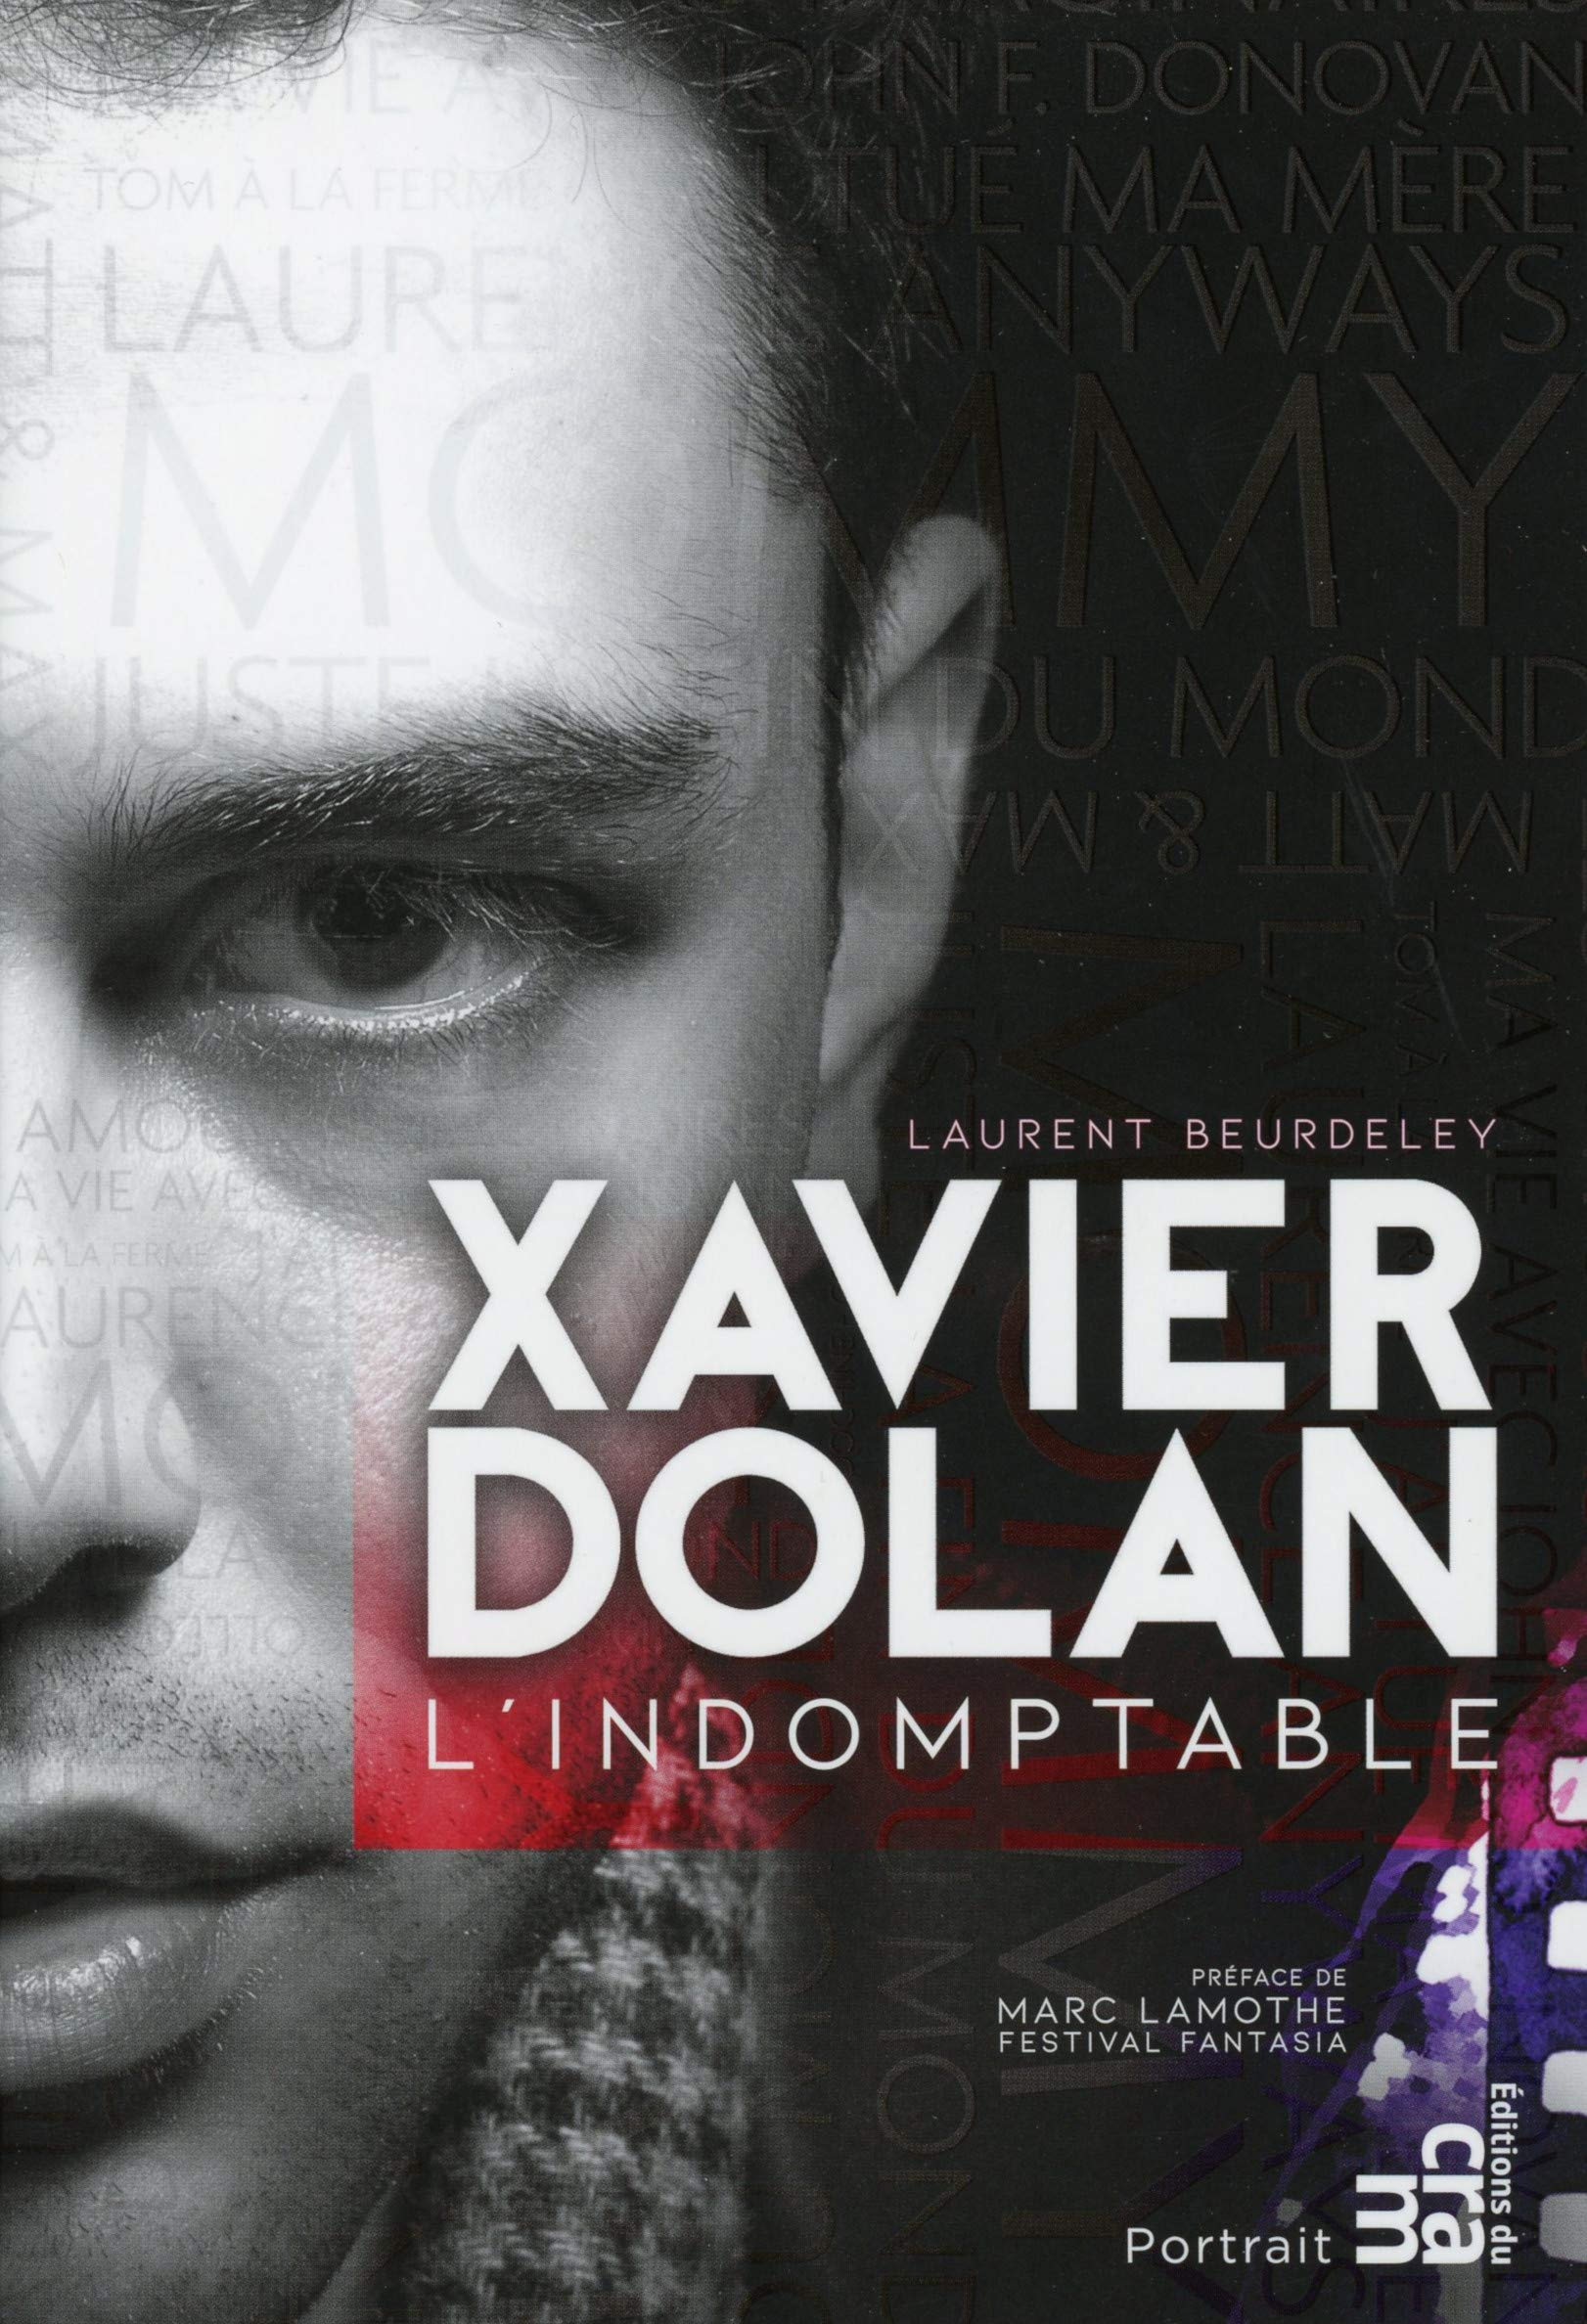 Xavier Dolan L Indomptable 9782897211929 Amazon Com Books